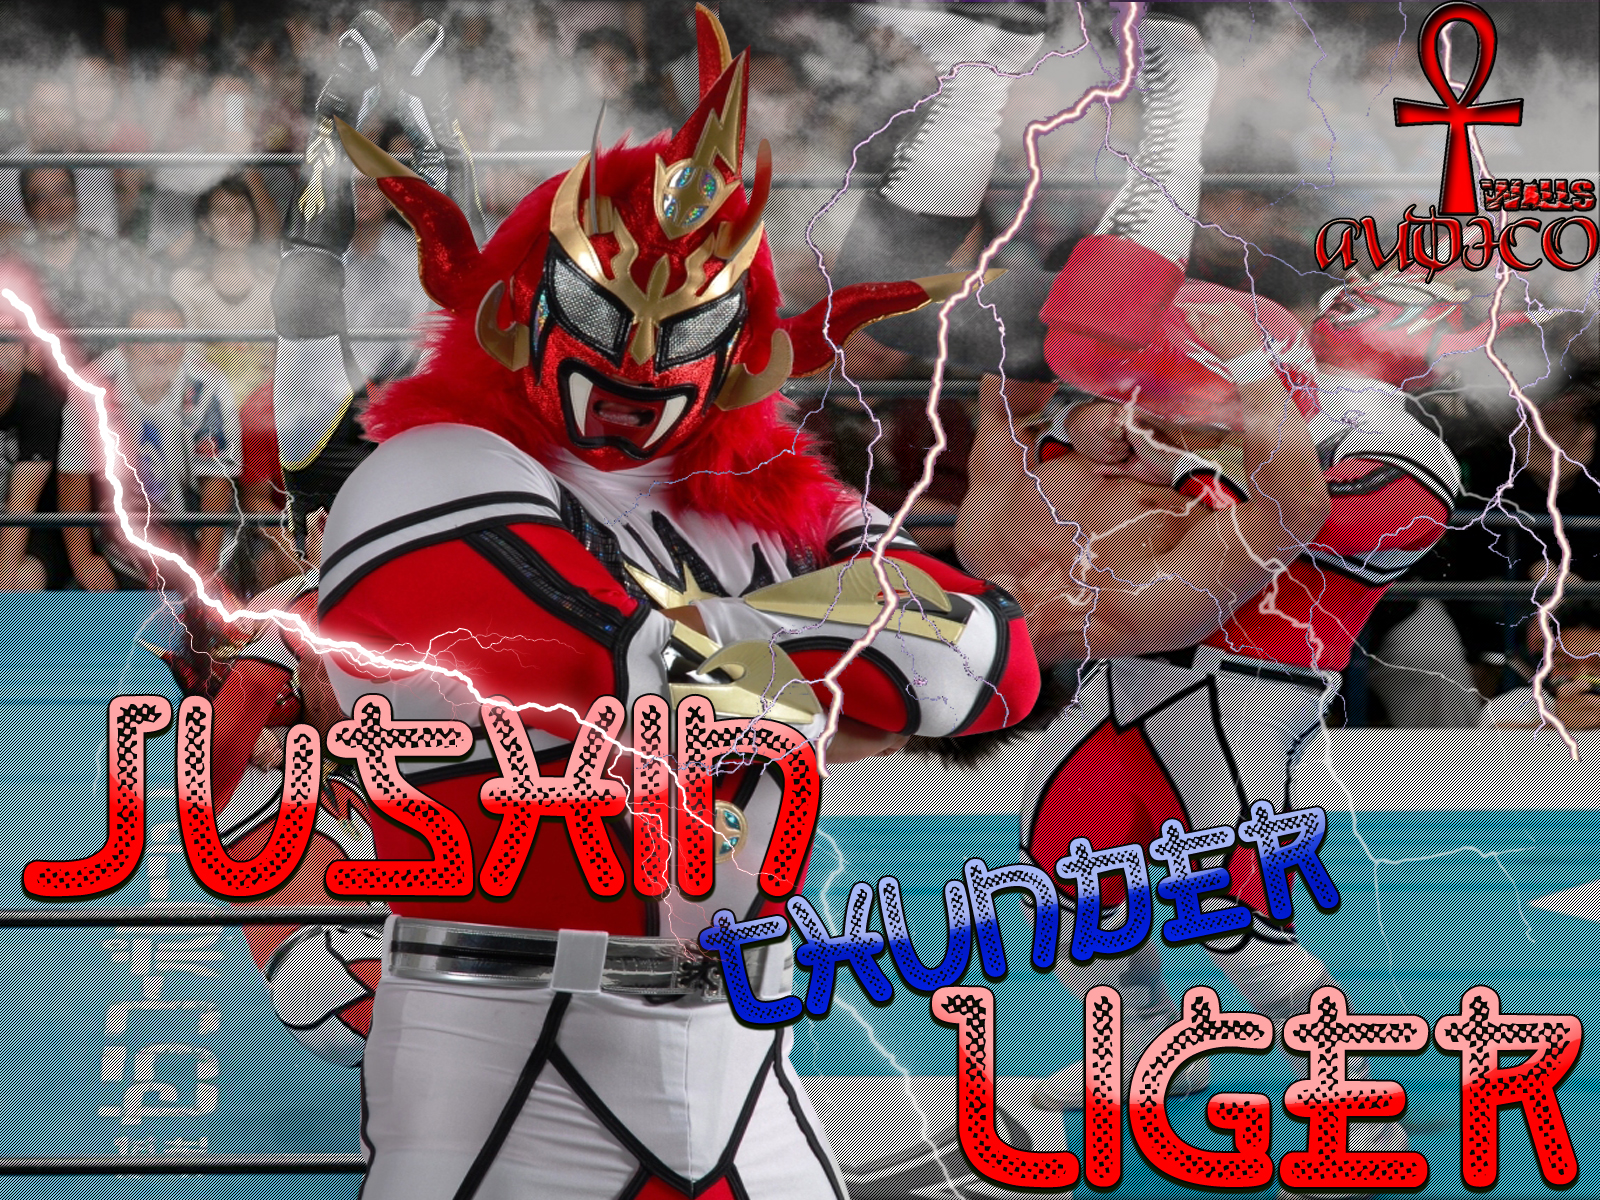 http://2.bp.blogspot.com/-t9FsEzKC1L4/T10nCkOeDvI/AAAAAAAAMaU/PT4tKP8BICE/s1600/Jushin+Thunder+Liger+Wallpaper+by+Audico+March+2012.jpg